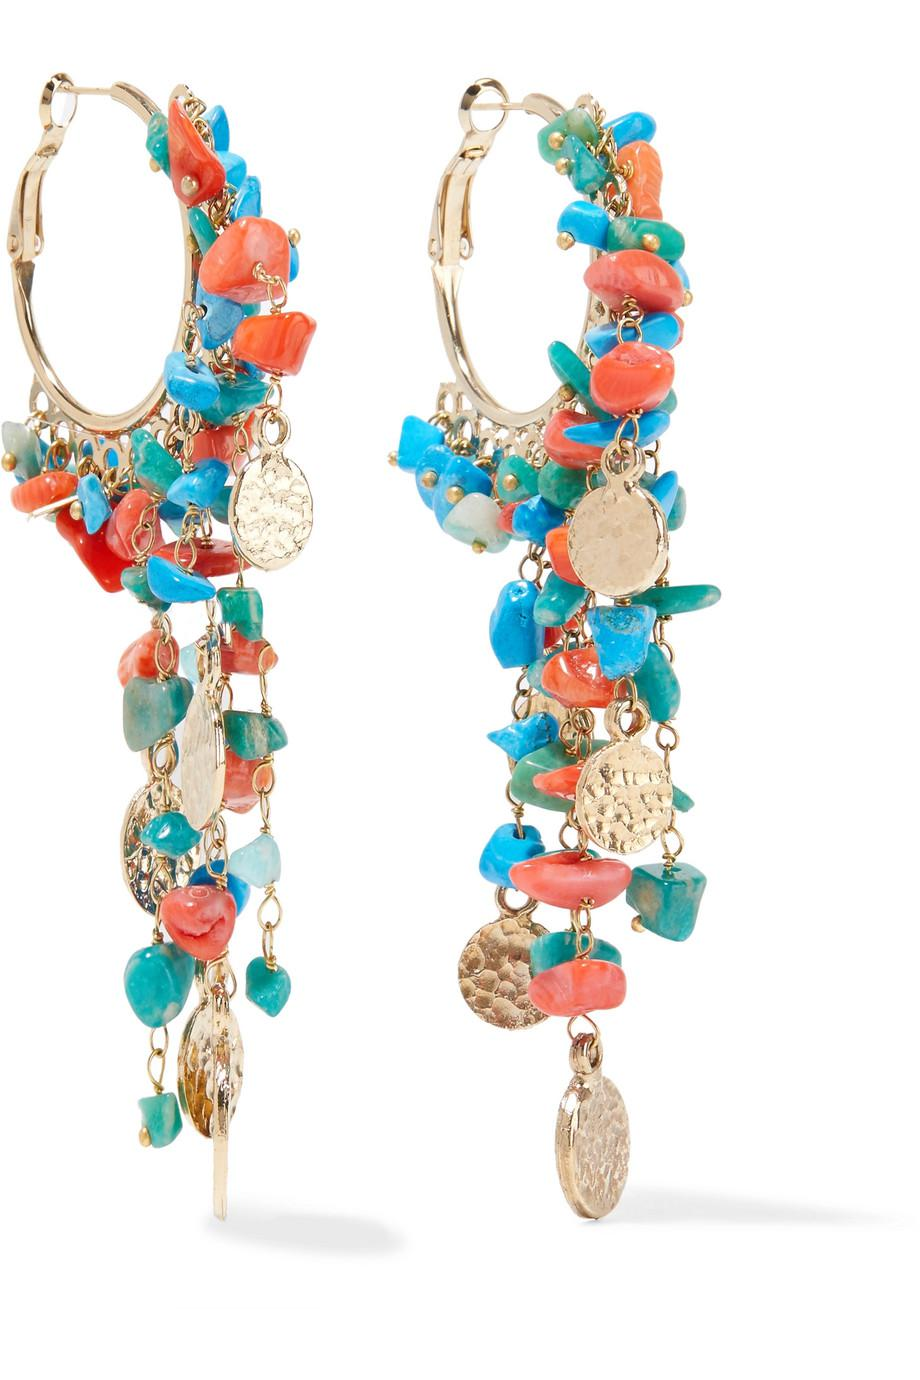 Vento Gold-tone Beaded Hoop Earrings - Blue Rosantica wKGmUotR9